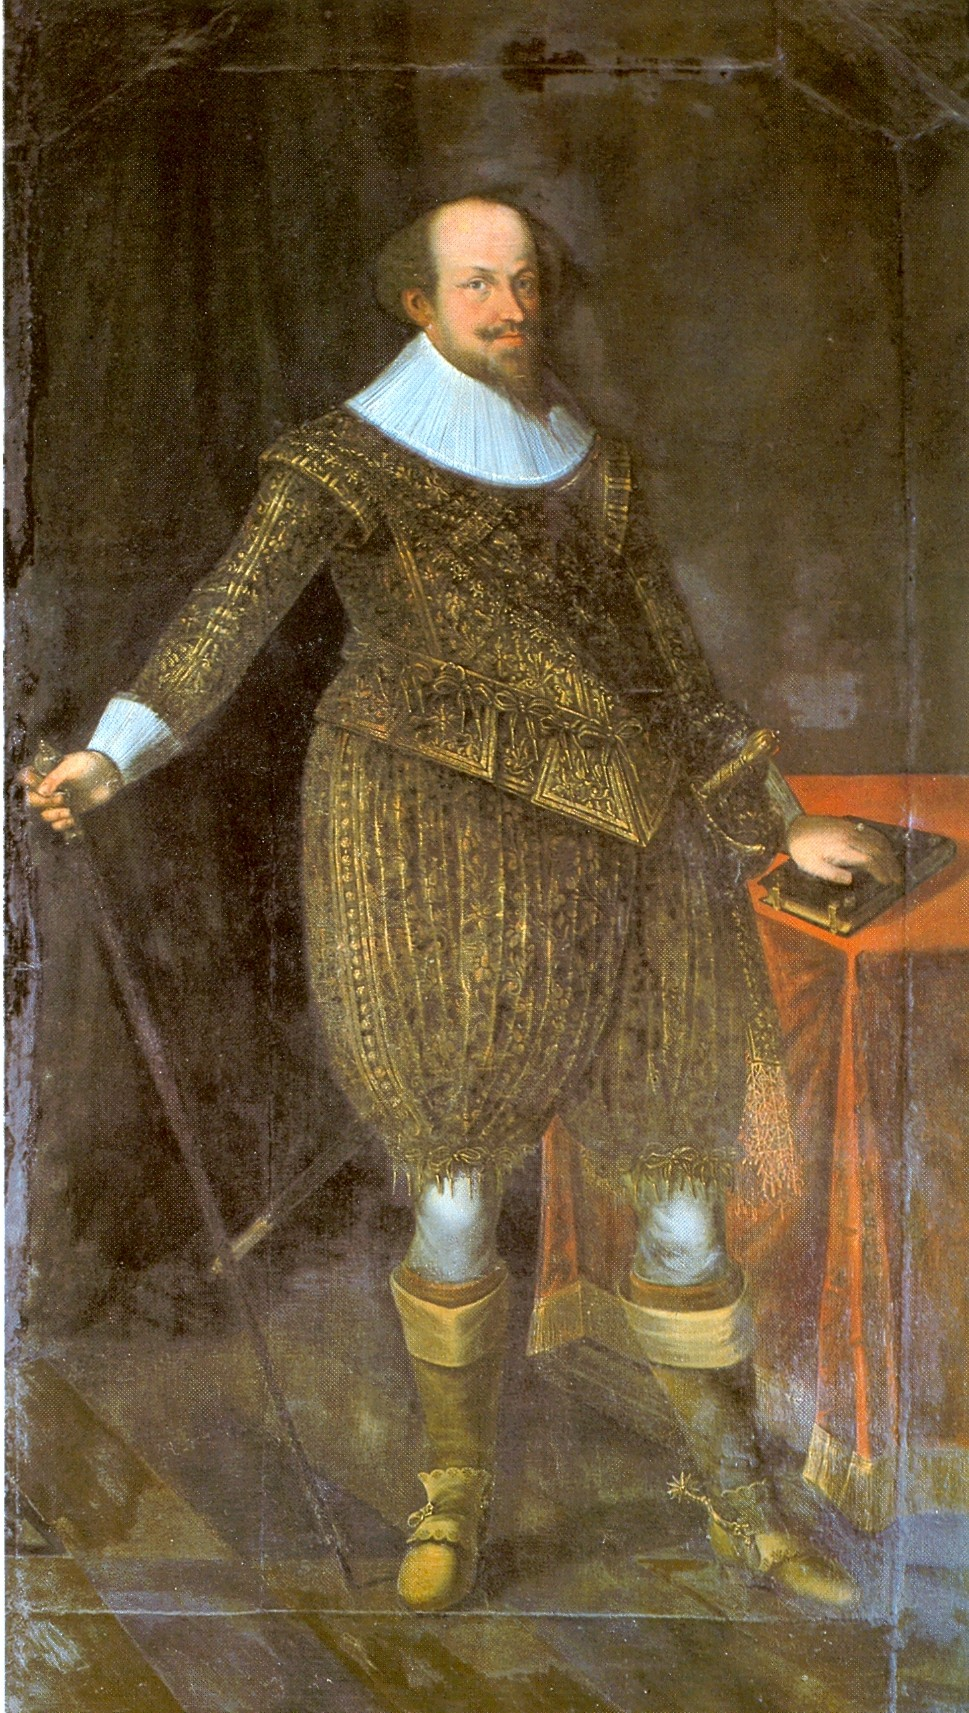 hertog Johan Frederik van Württemberg 1582 –1628.